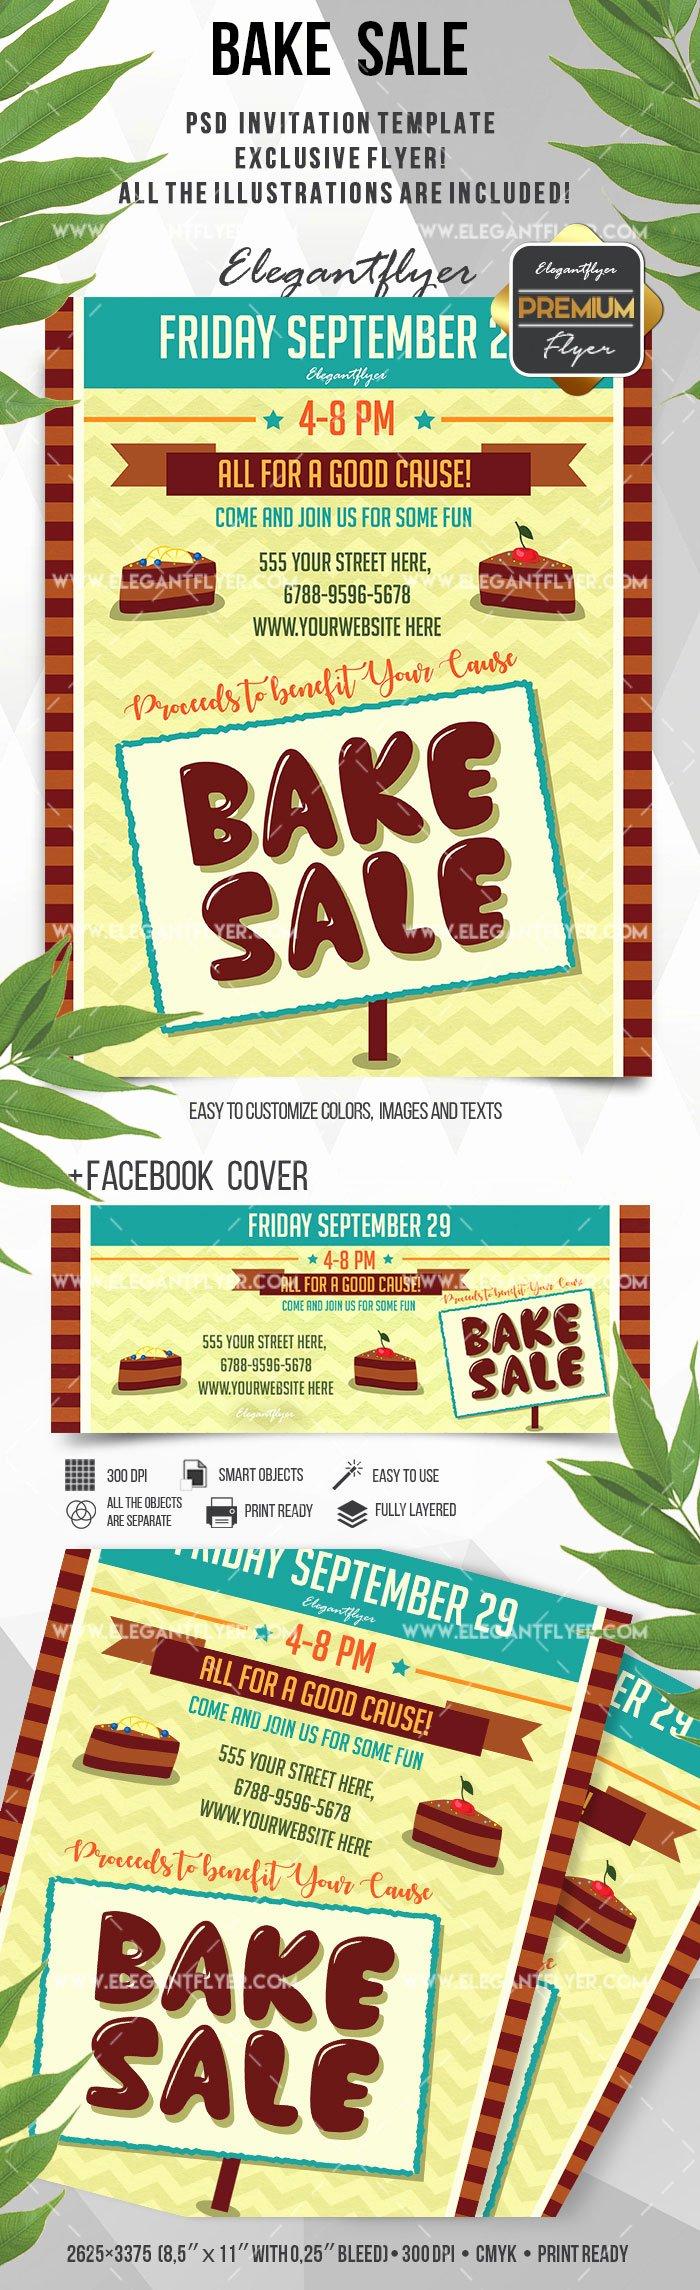 Bake Sale Flyer Template Awesome Flyer for Bake Sale Bakery – by Elegantflyer